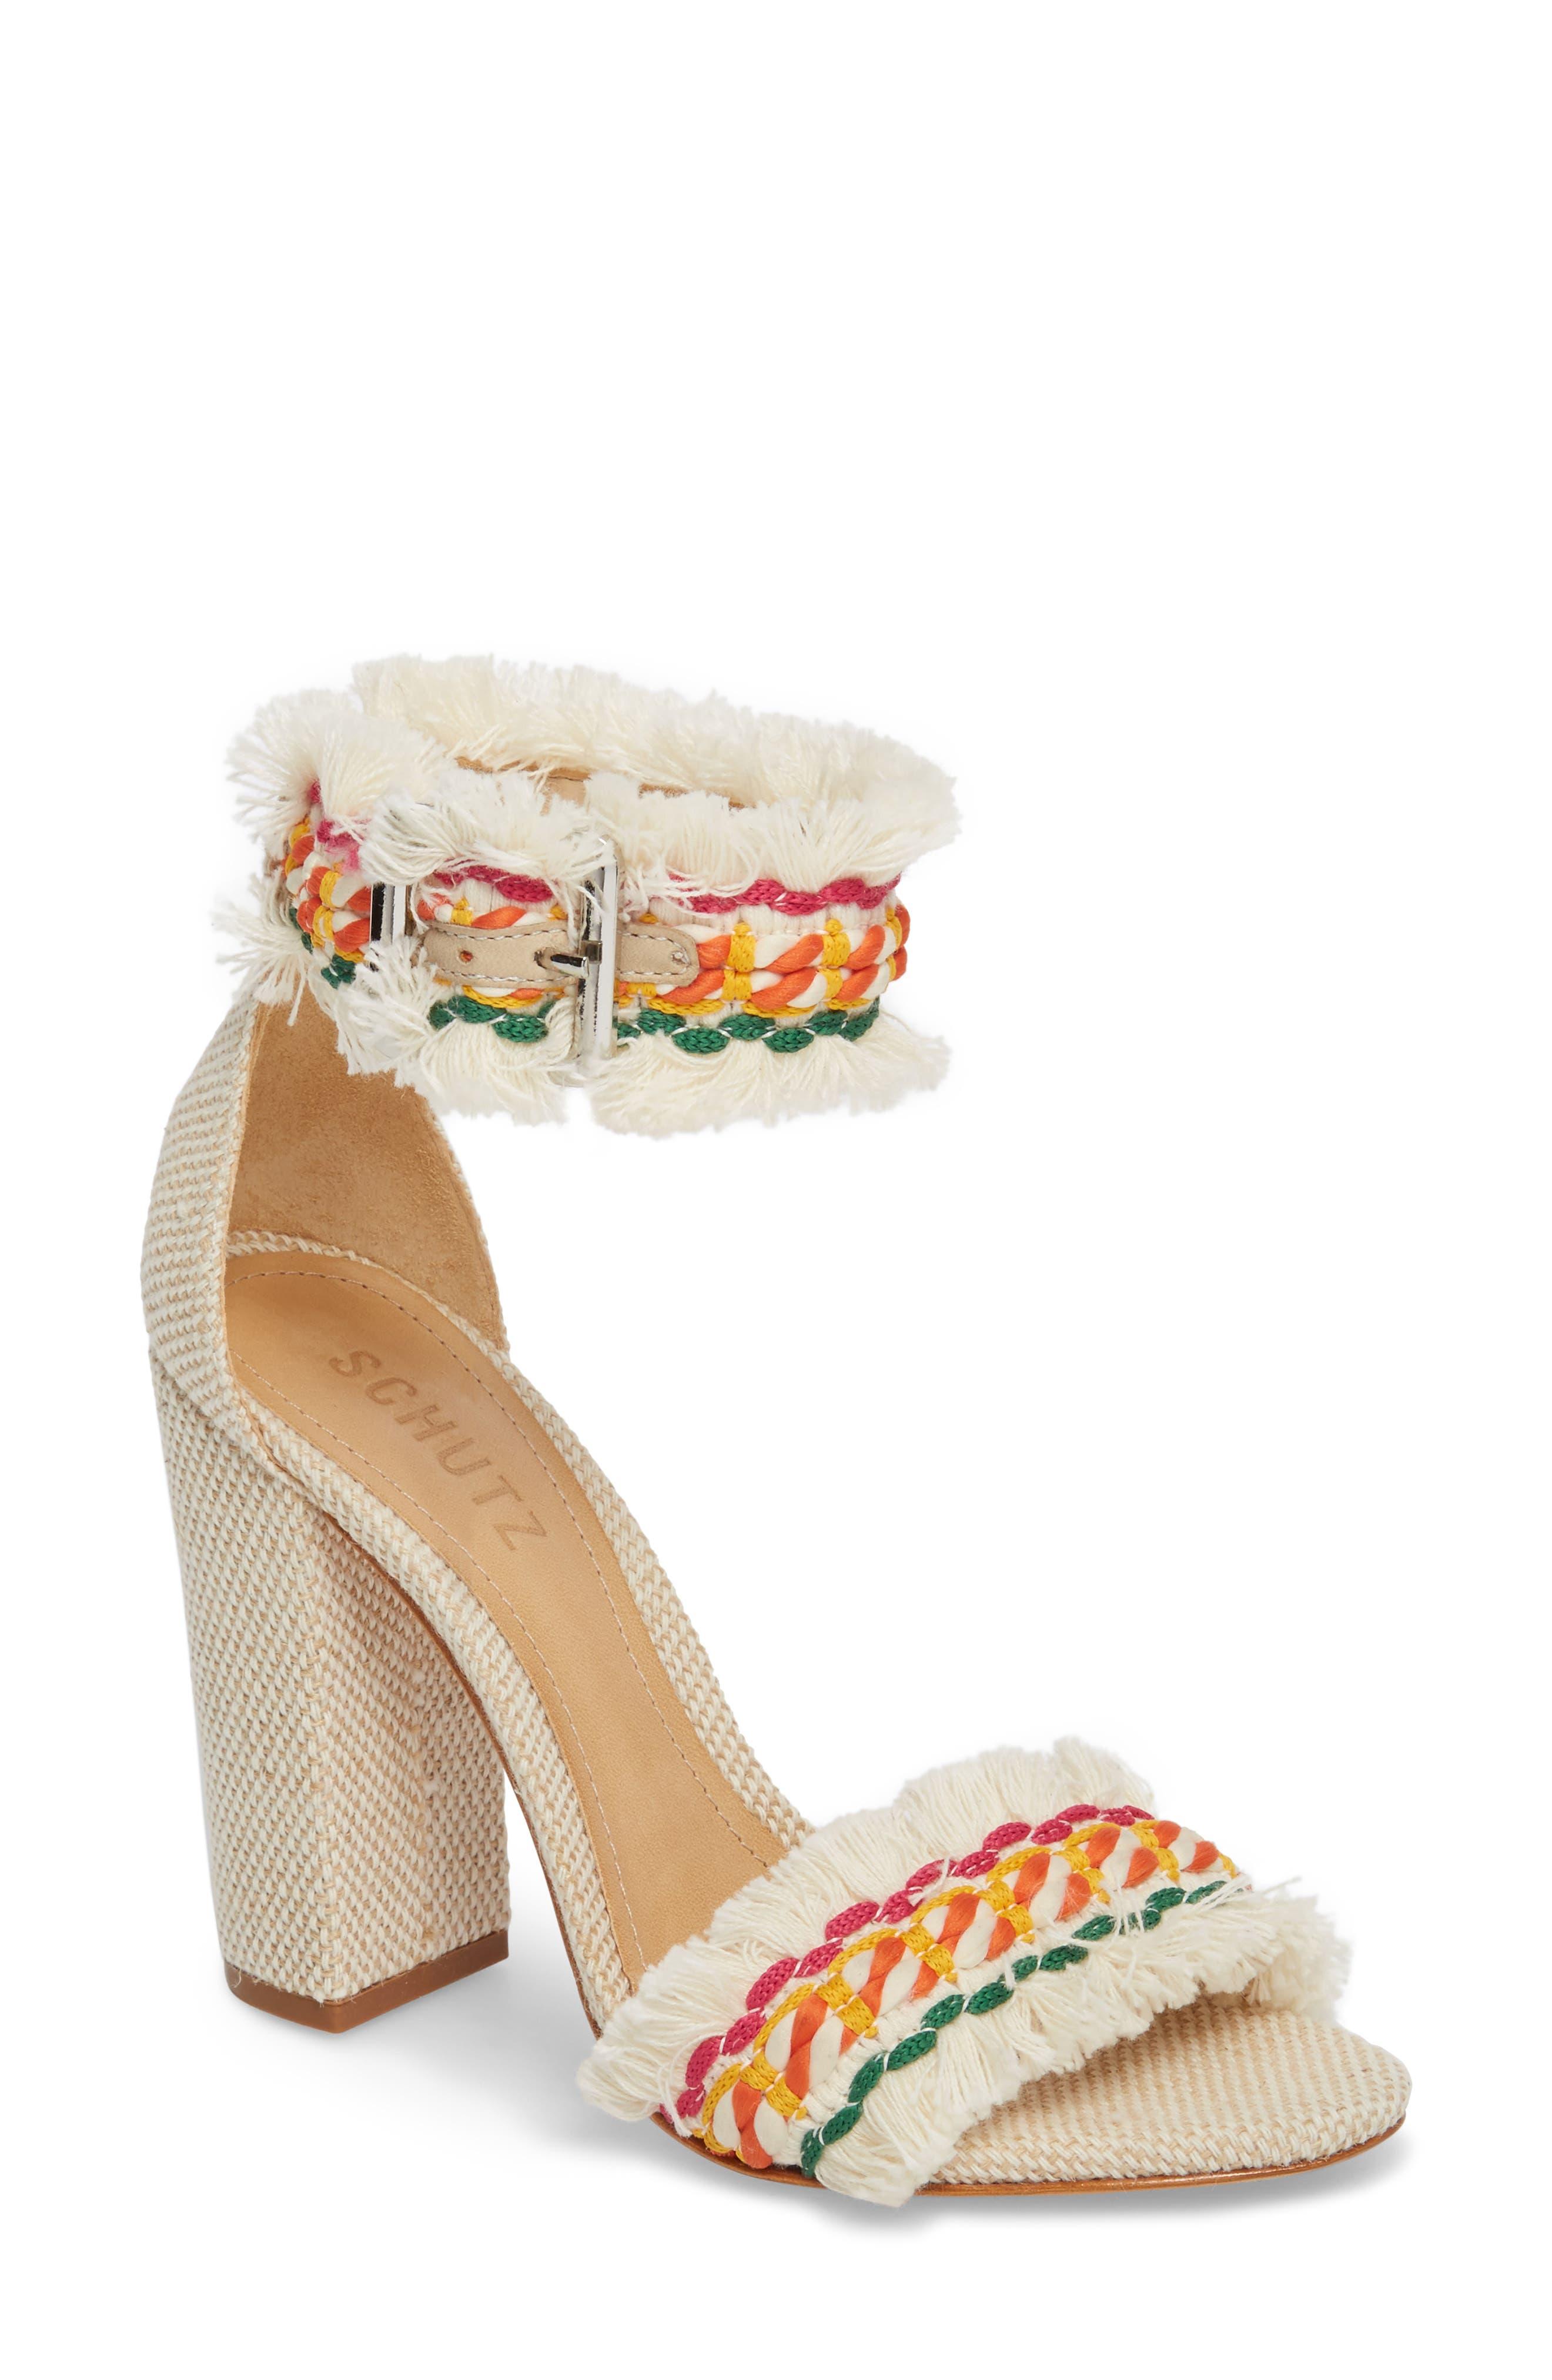 Zoola Block Heel Sandal,                         Main,                         color, White Multi Print